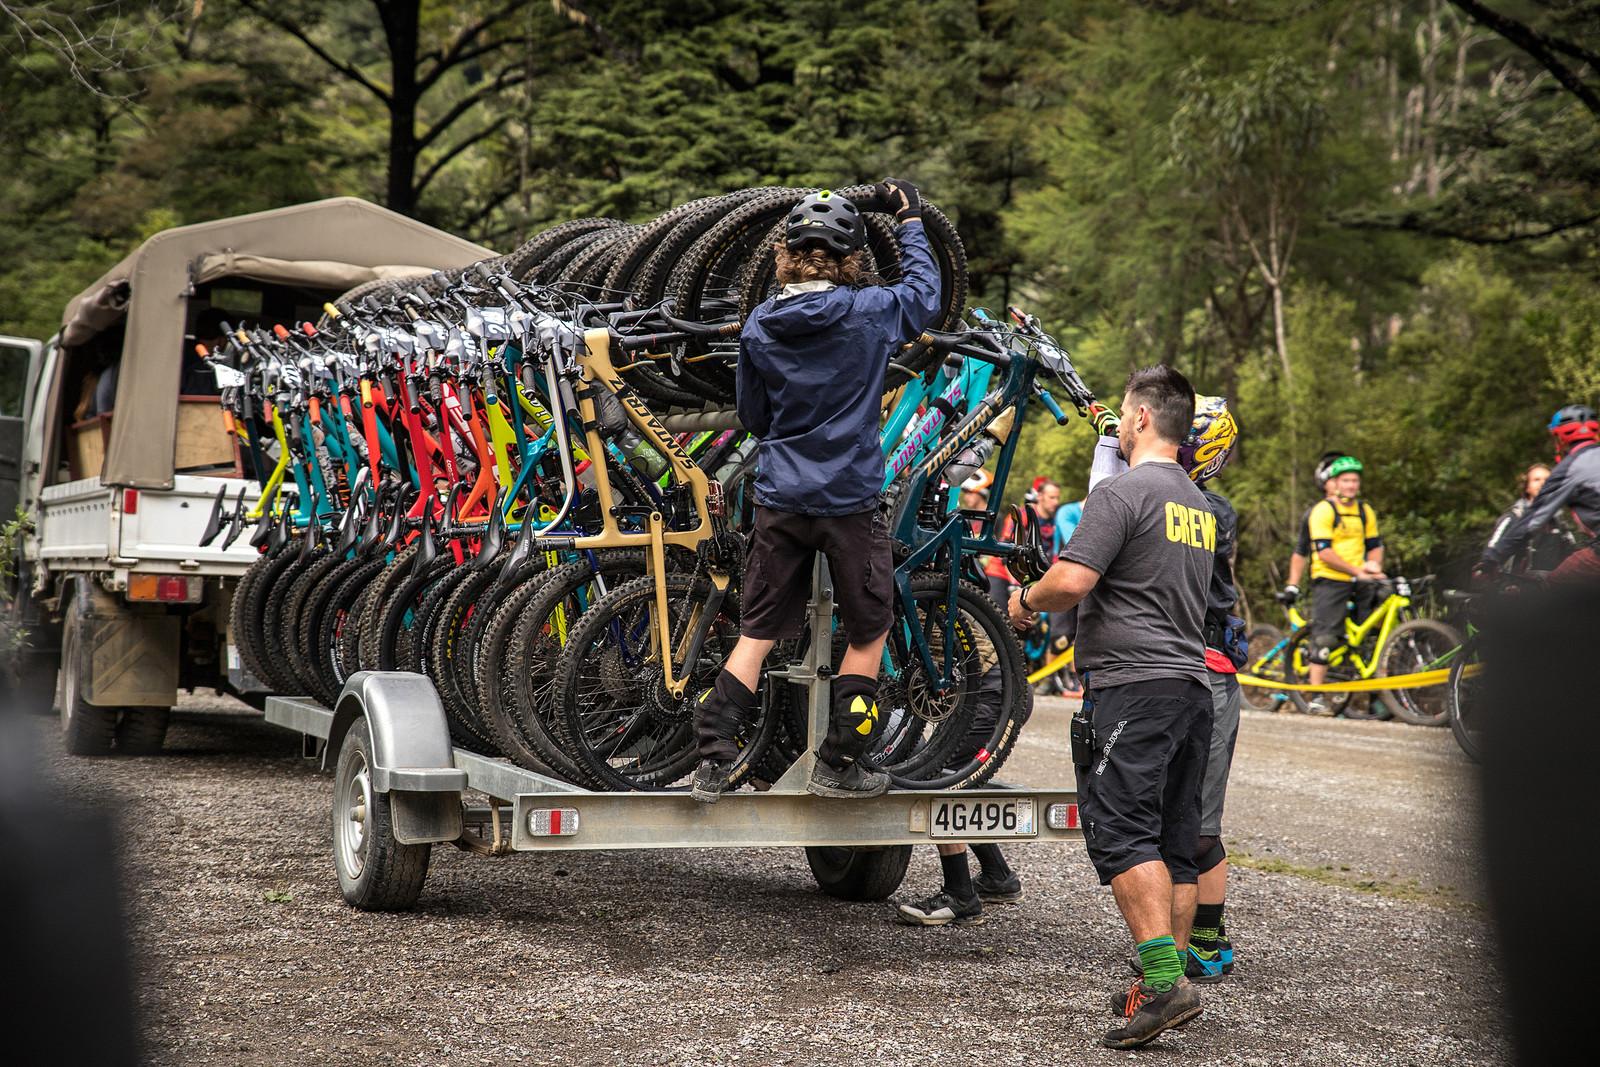 Nelson MTB Club Shuttle - 2018 Dodzy Memorial Gallery & Race Report - Mountain Biking Pictures - Vital MTB